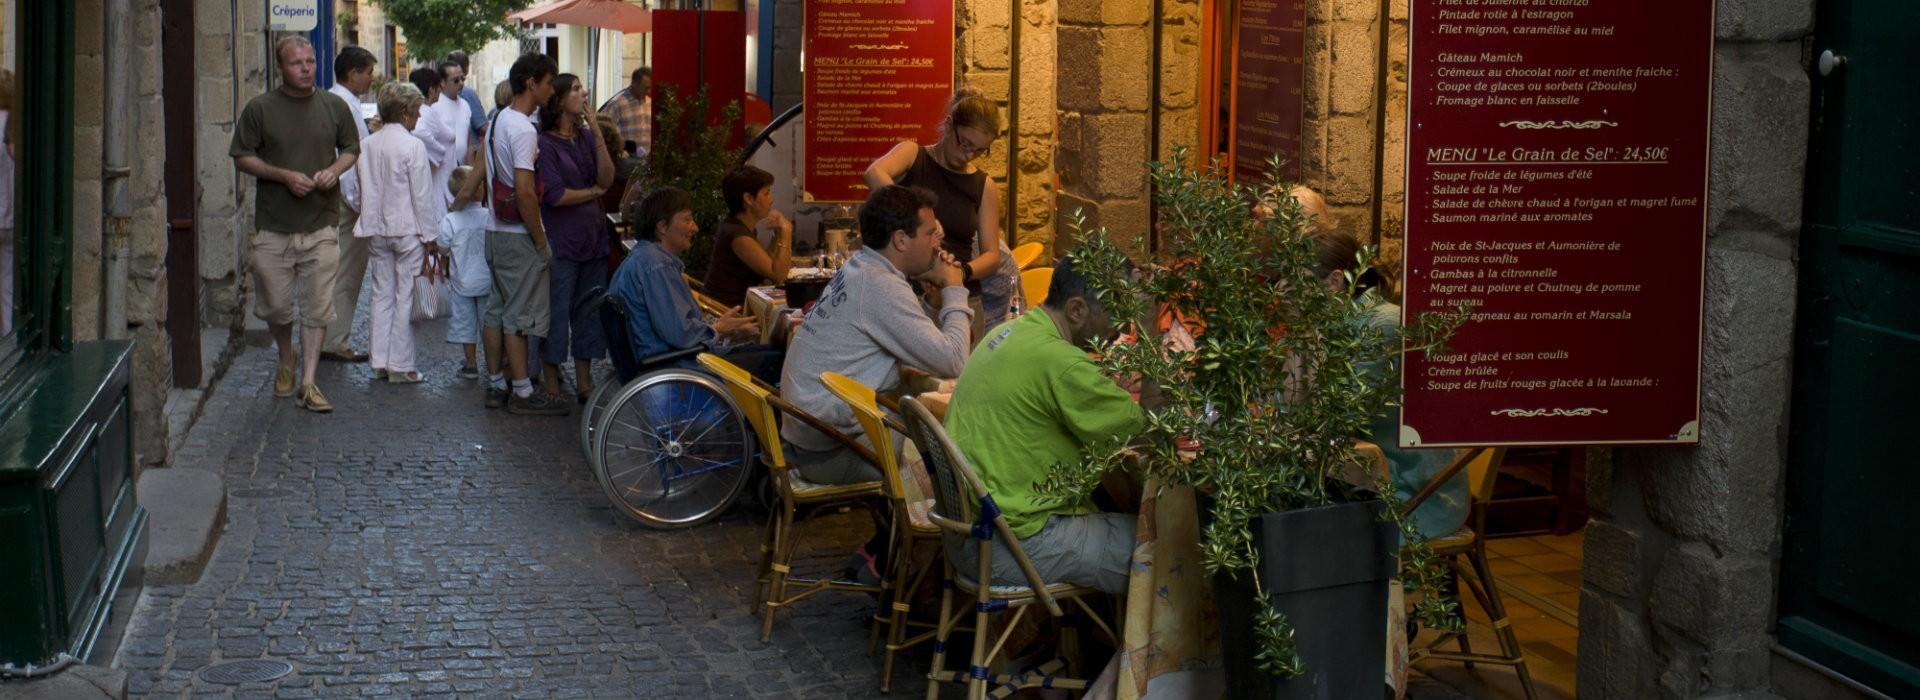 Restaurants accessibles La Baule Presqu'île de Guérande